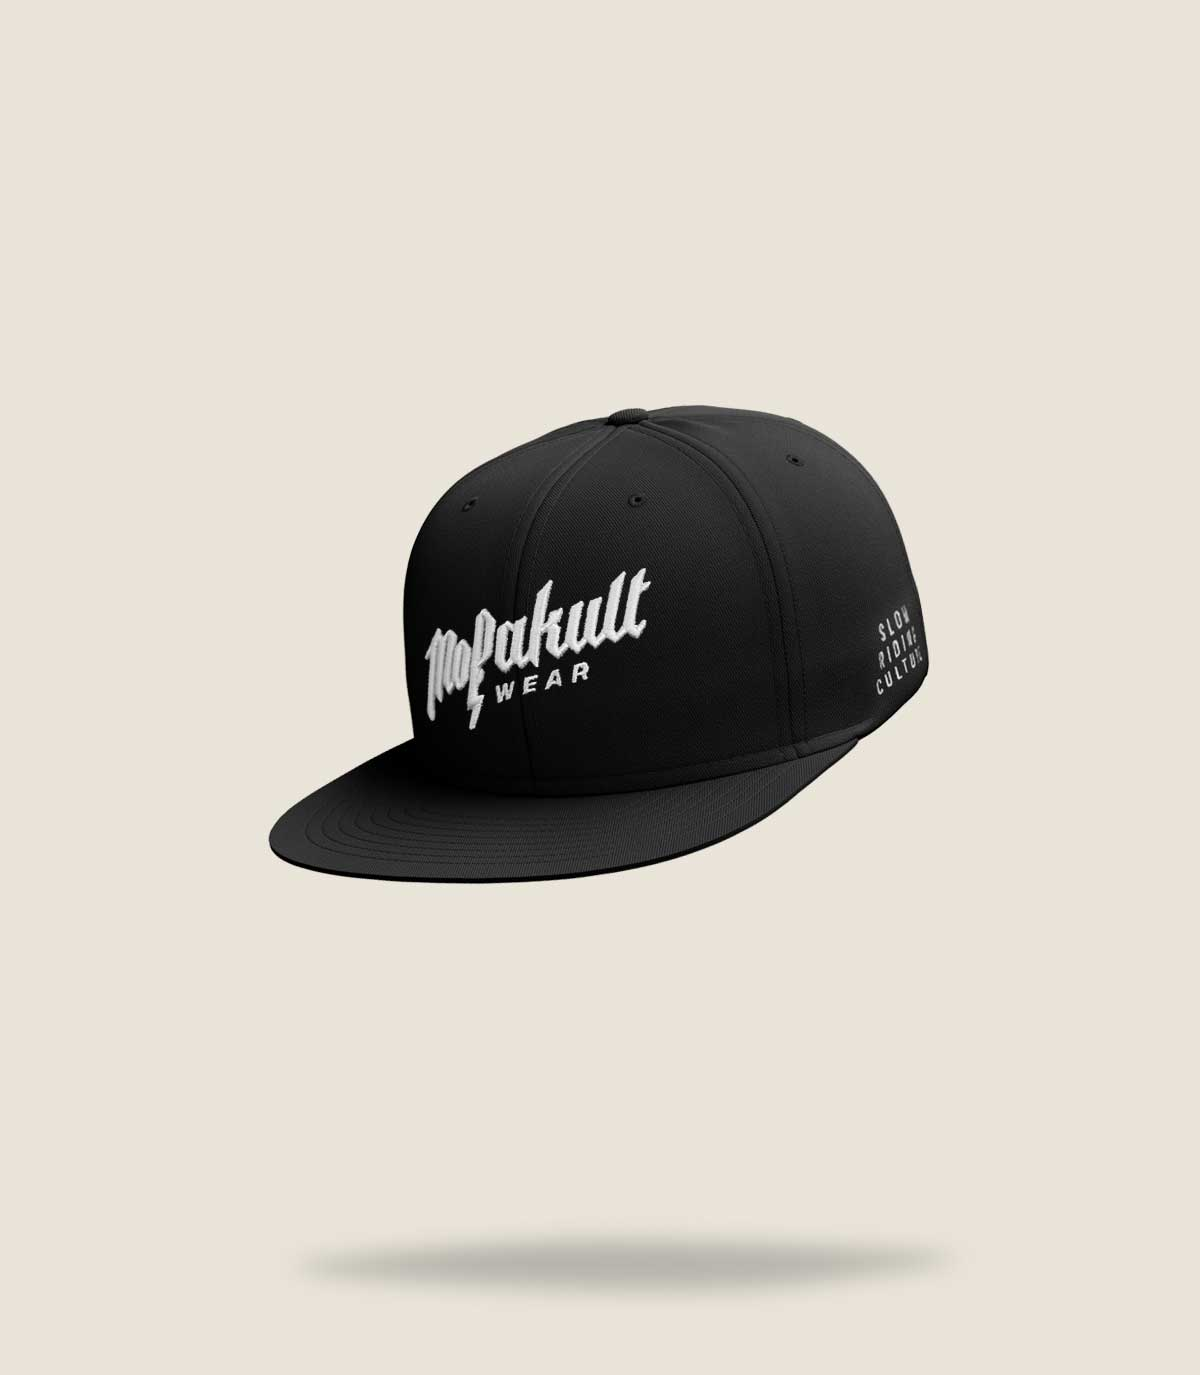 Mofakultwear Snapback Cap Black